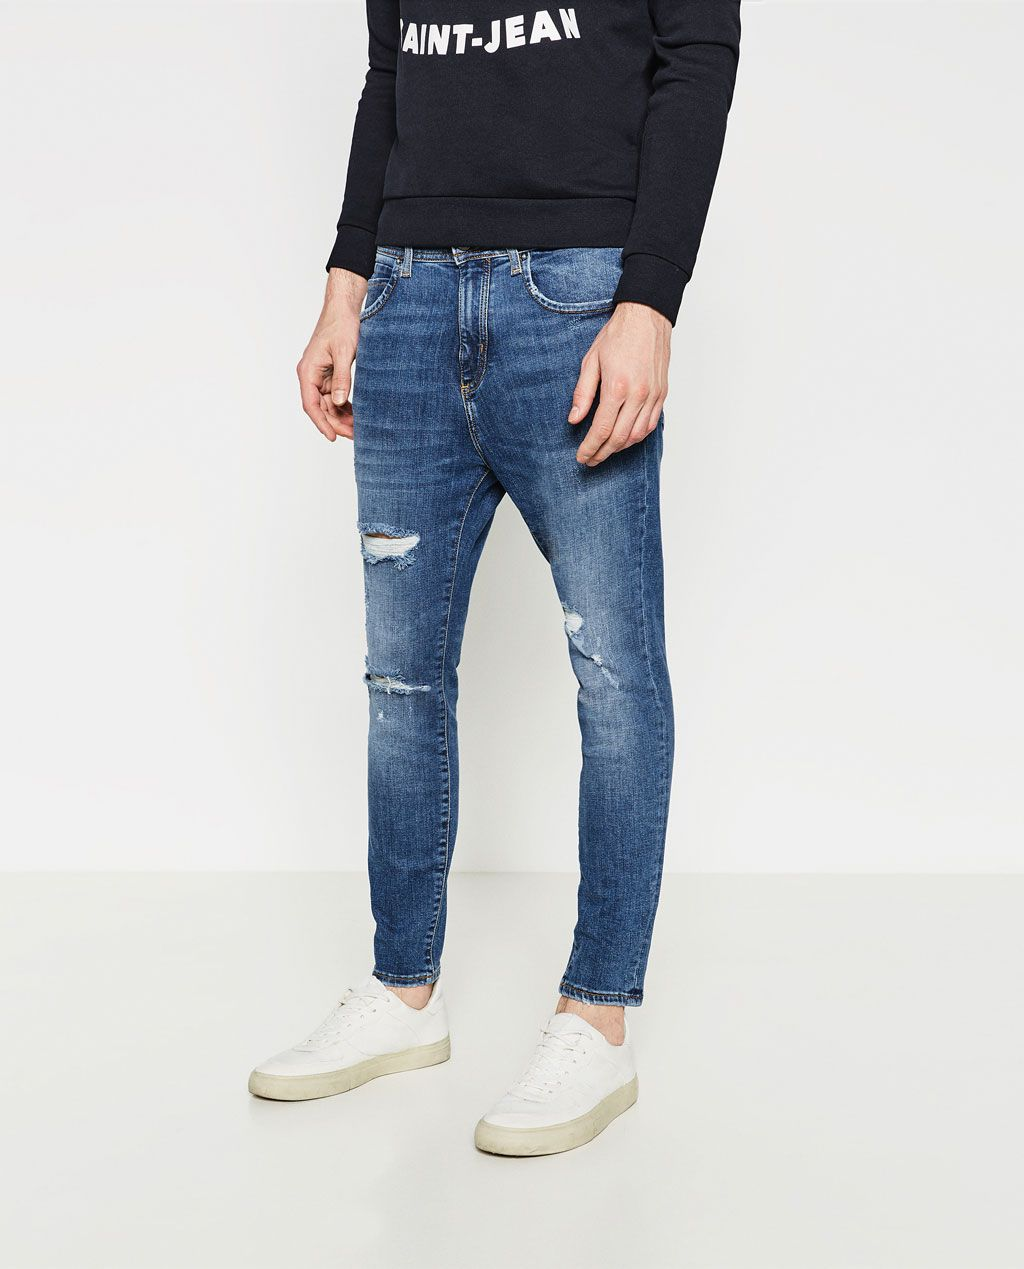 Zara Man Jeans White Denim Men Pant Zara Basic Collection